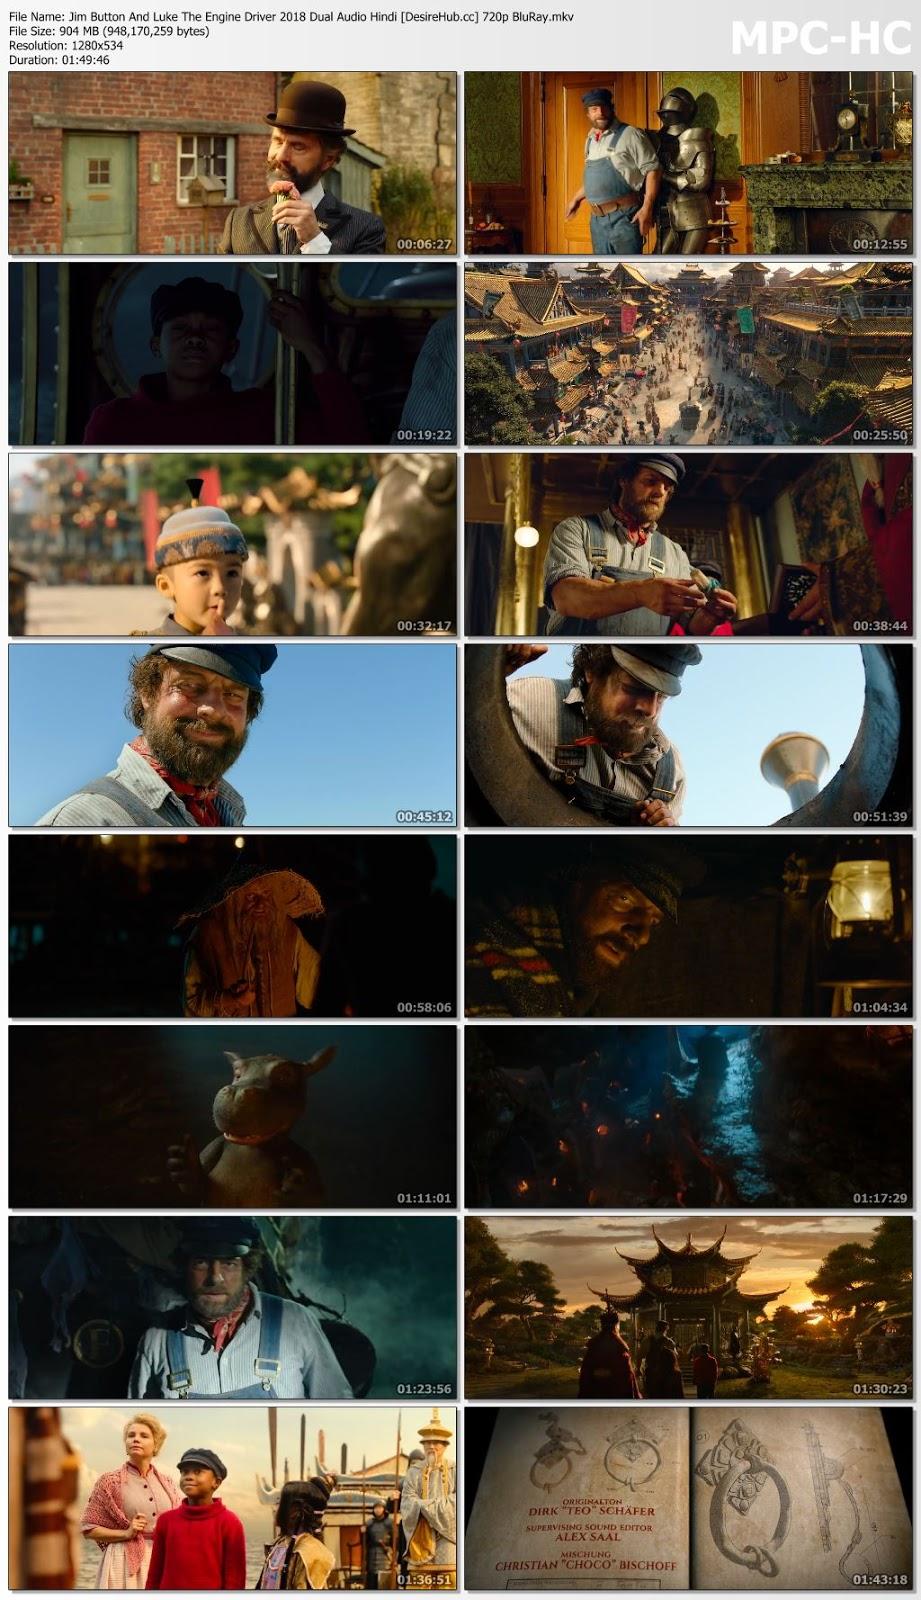 Jim Button And Luke The Engine Driver 2018 Dual Audio Hindi 480p BluRay 300mb Desirehub